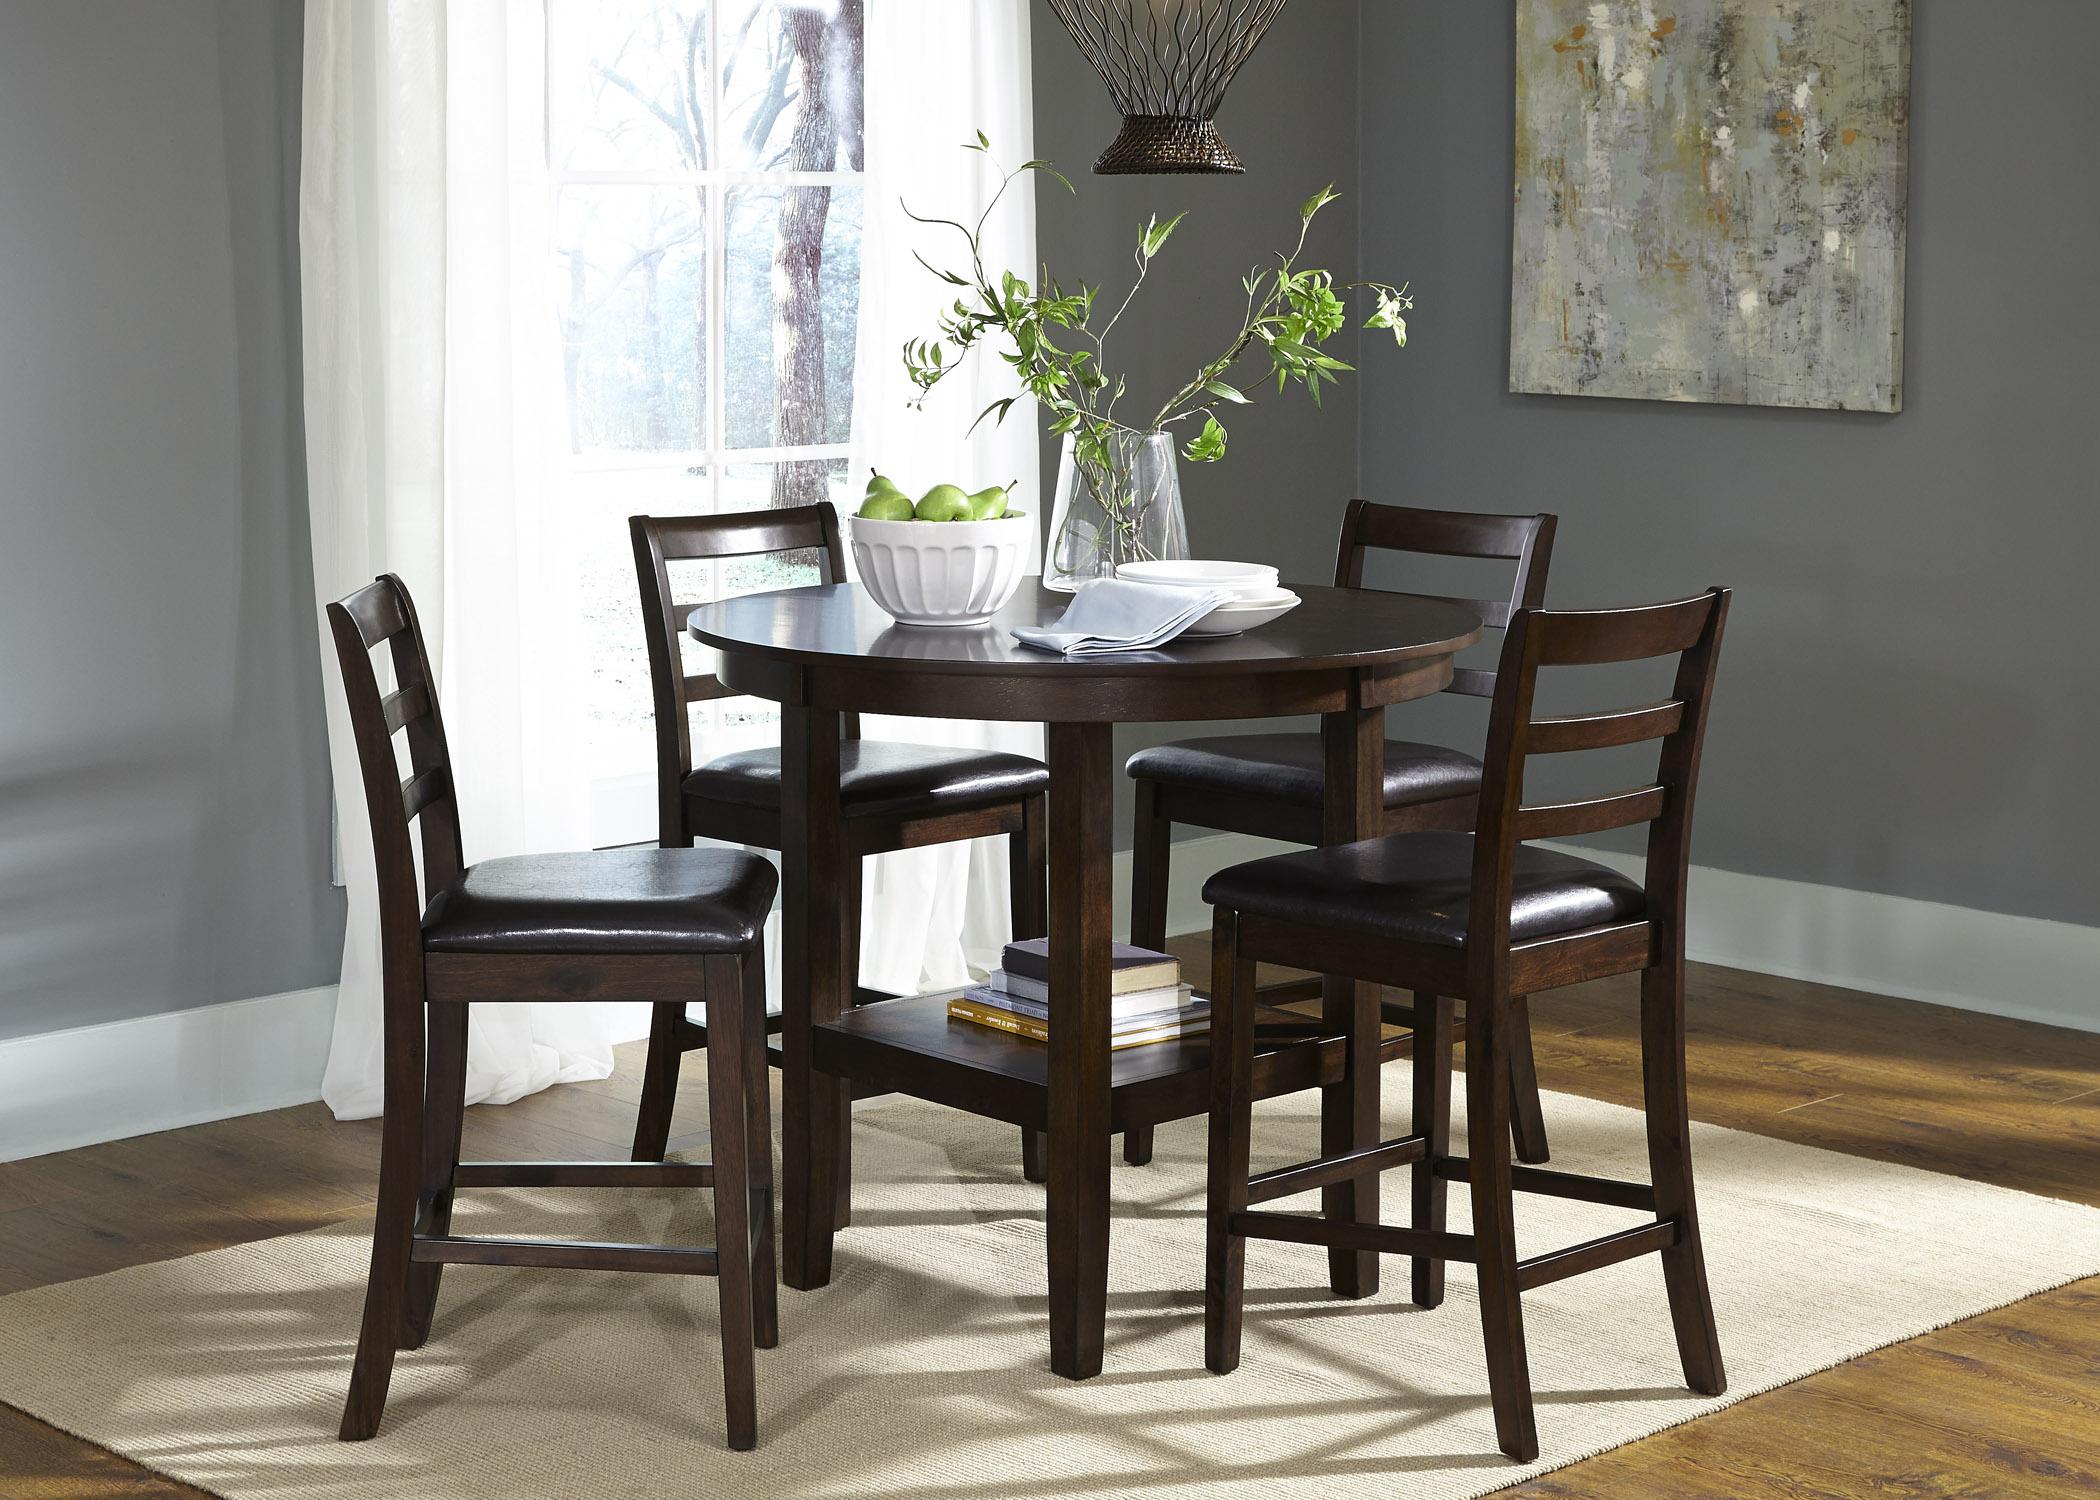 Liberty Furniture Bradshaw Casual Dining5 Piece Pub Table Set